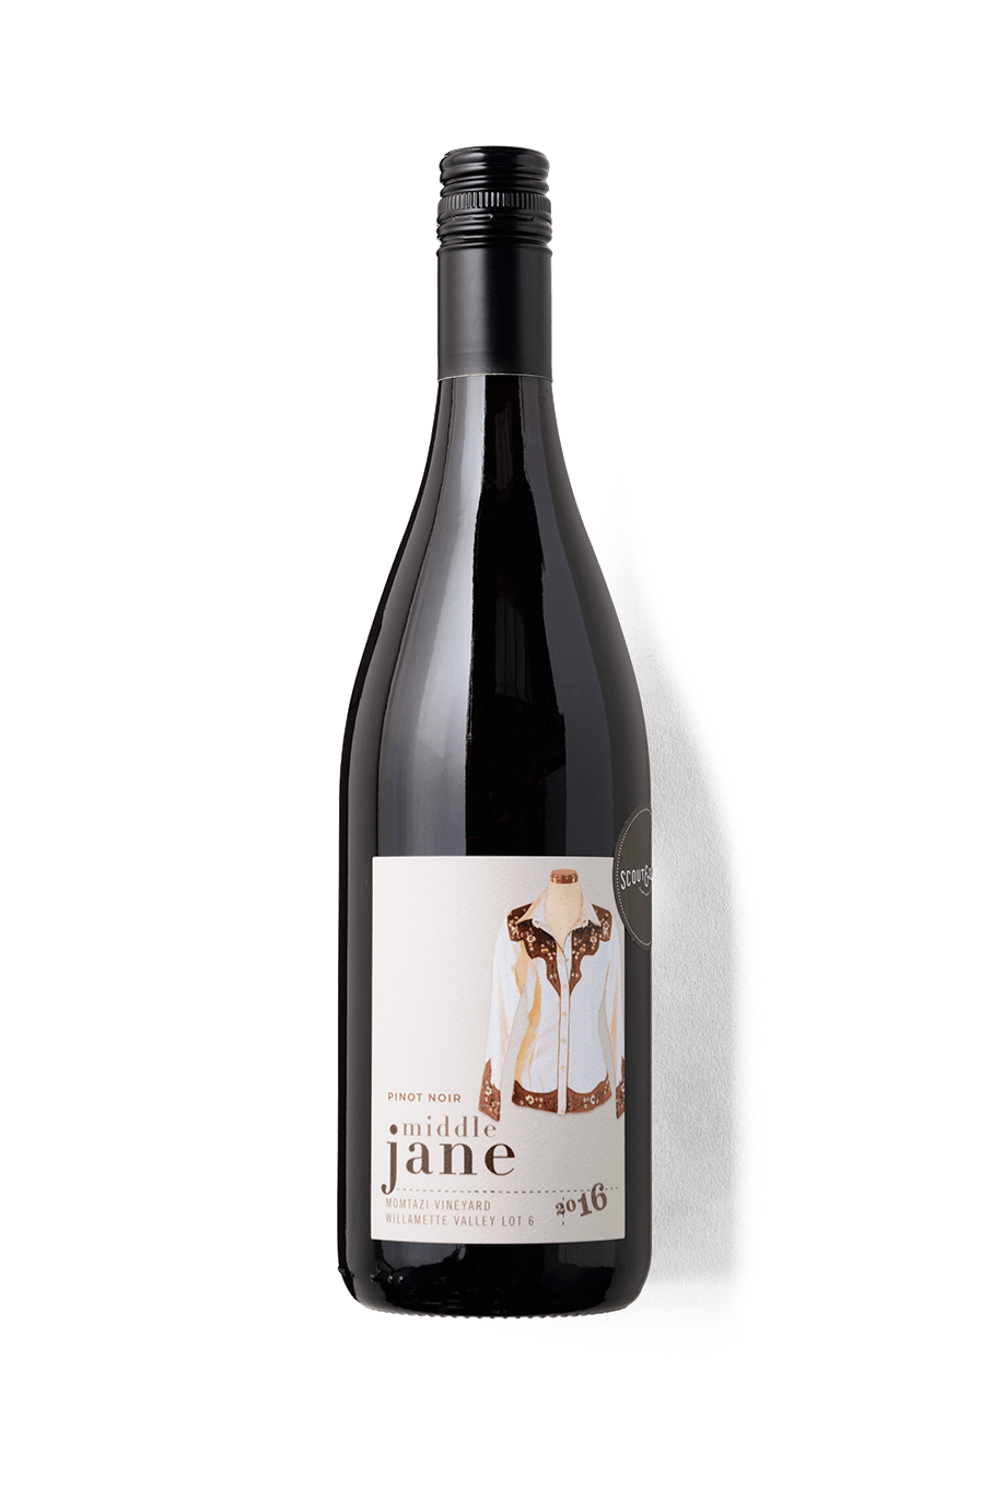 2016 Middle Jane Pinot Noir Lot 6 Willamette Valley, Oregon